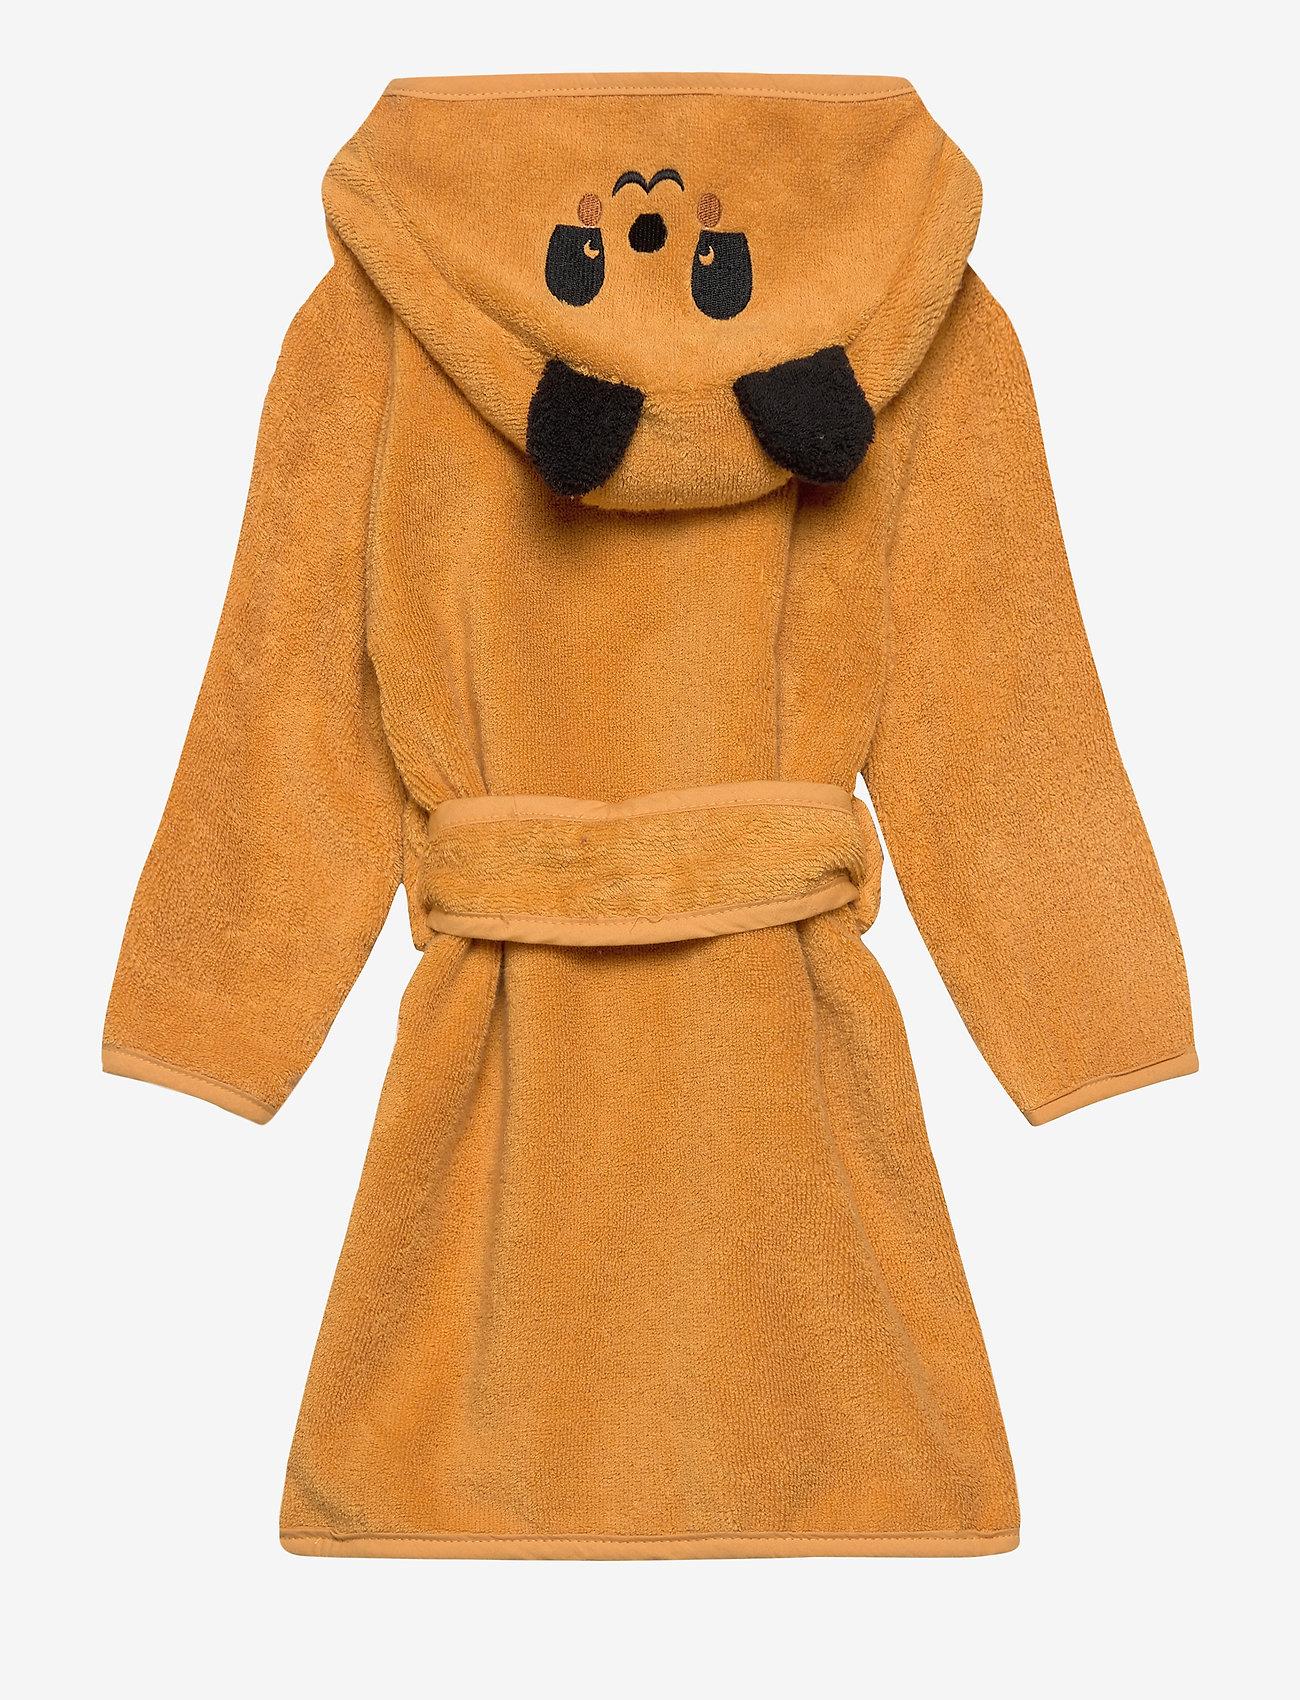 Pippi - Organic bath robe - bathrobes - mineral yellow - 1